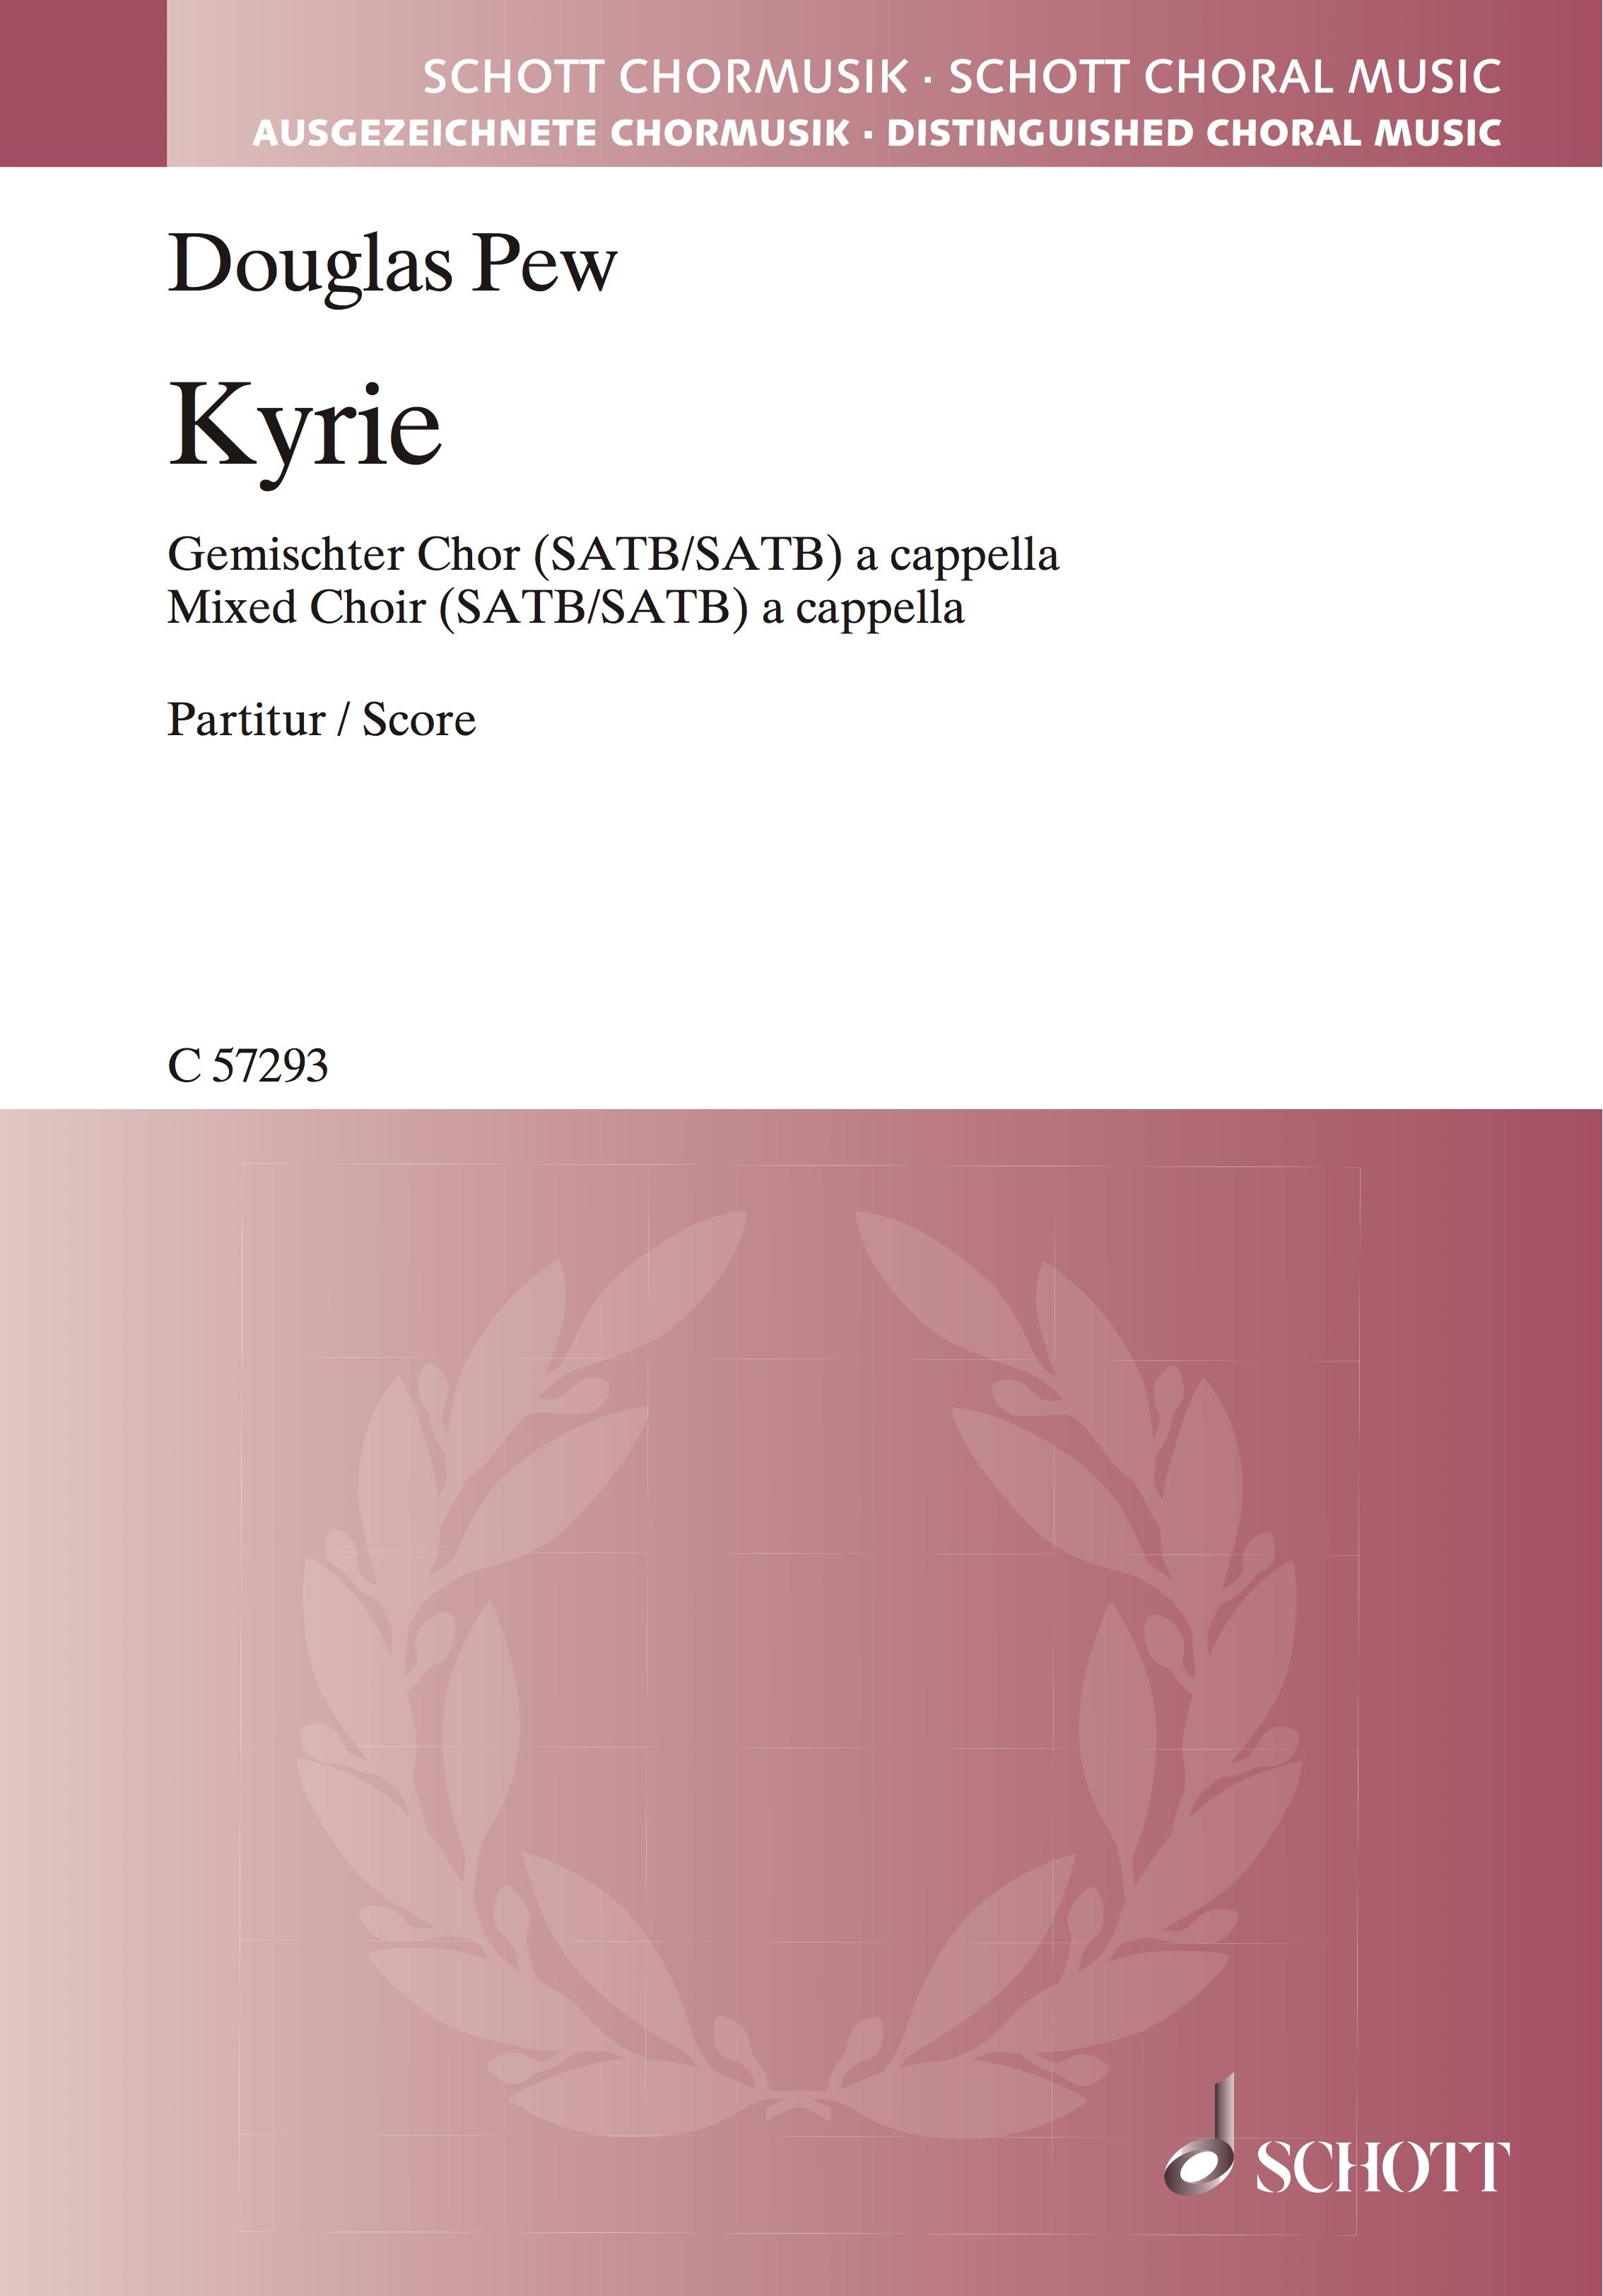 Kyrie    Double Chorus a cappella